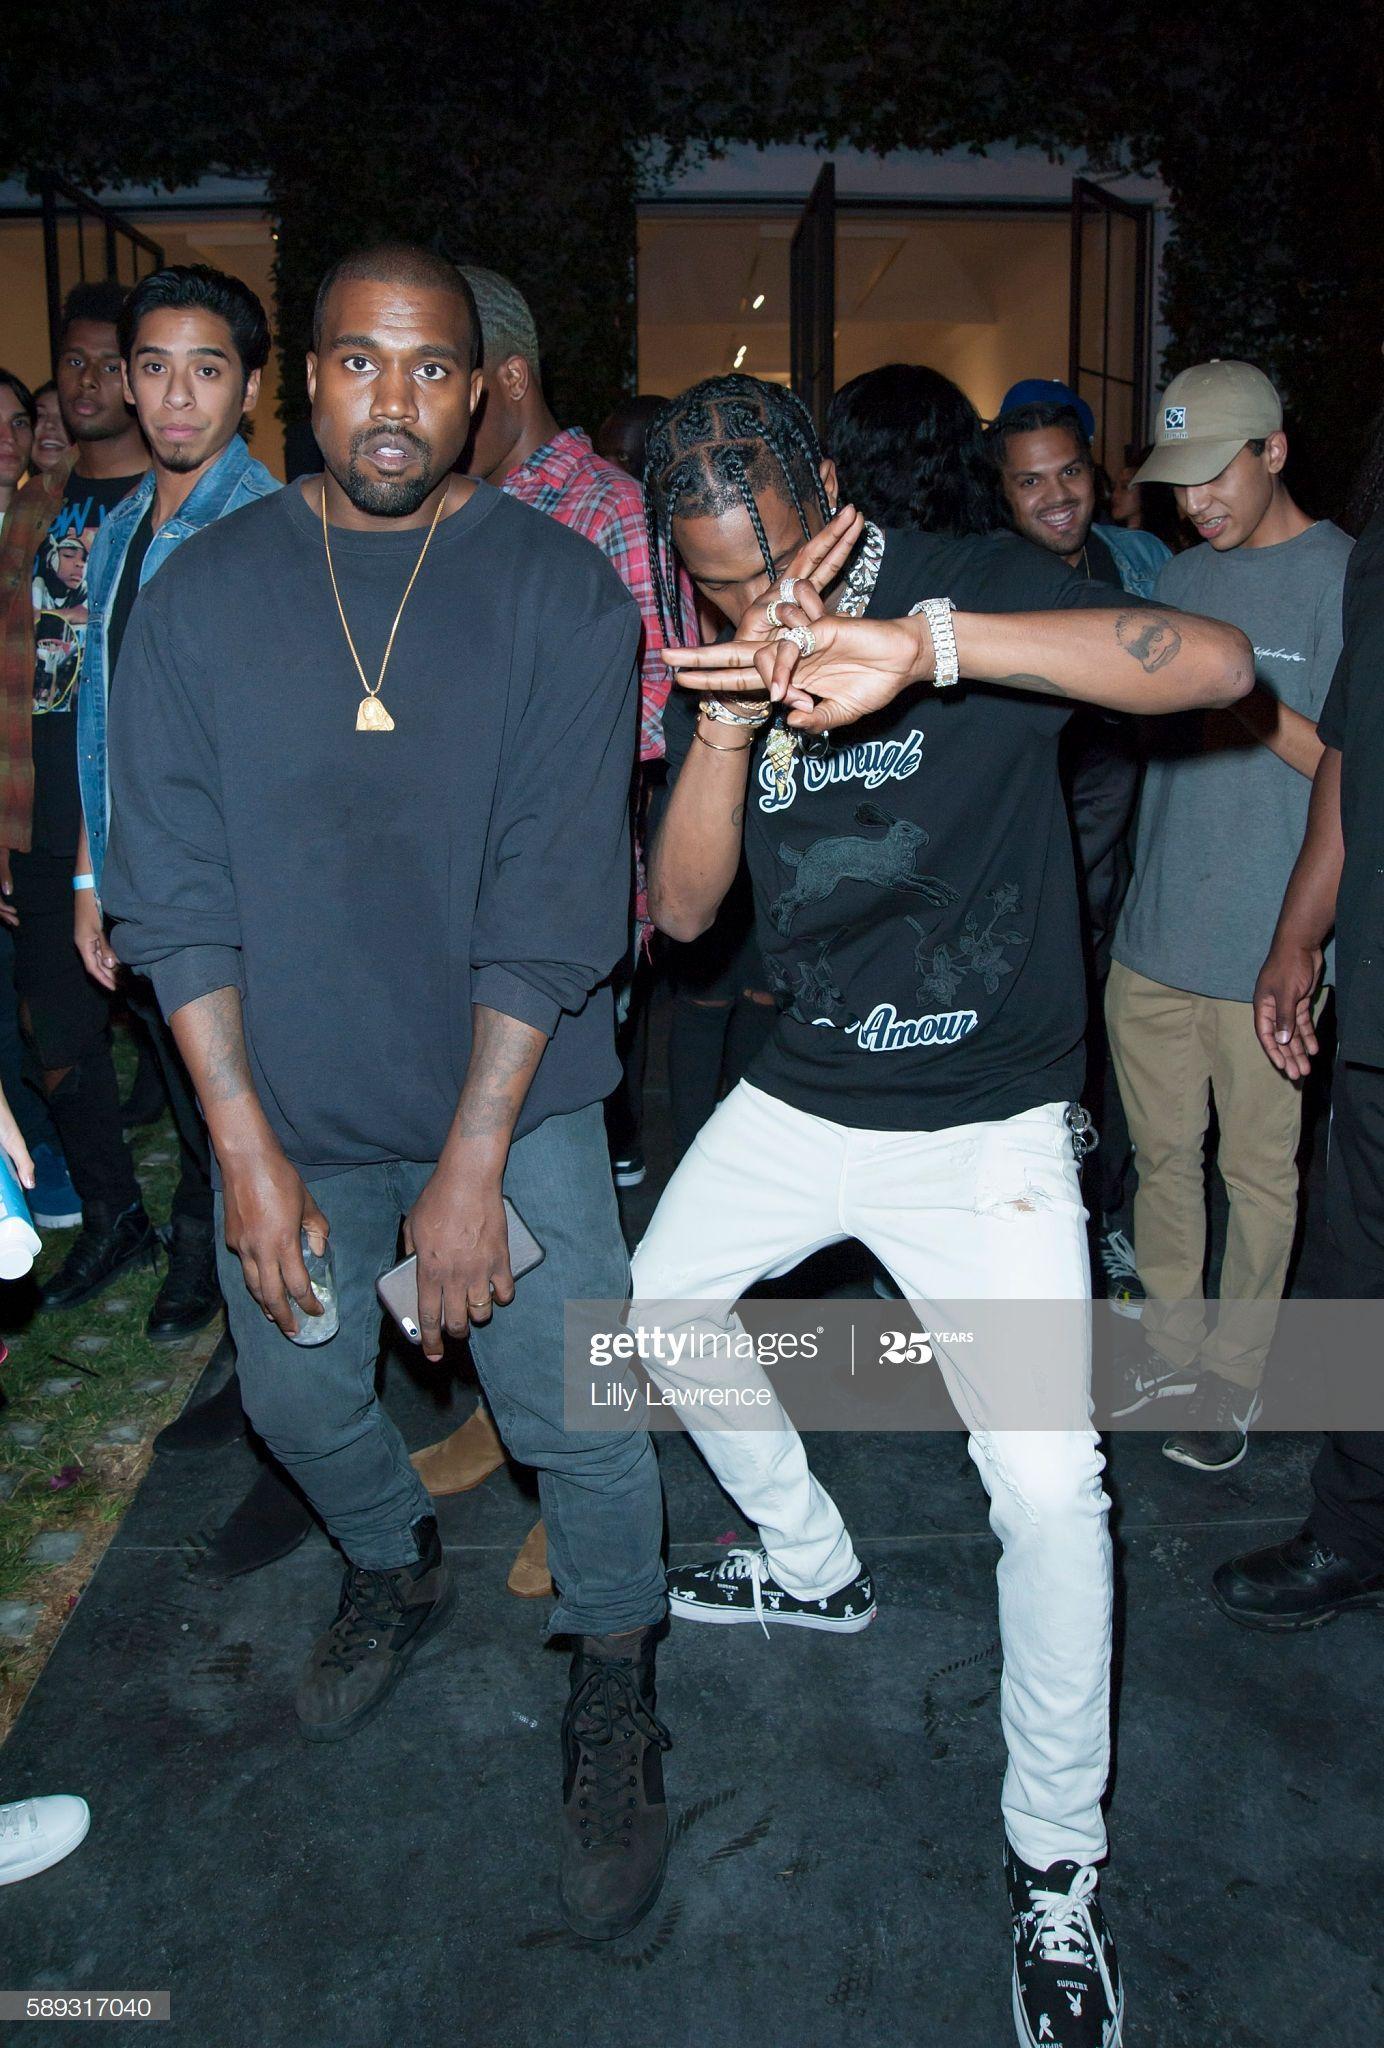 Travis Scott Sign X Risen Osiris O T O The Sign Of Baphomet Baphomet Osiris Risen Scott Travis In 2020 Kanye West Outfits Kanye West Style Travis Scott